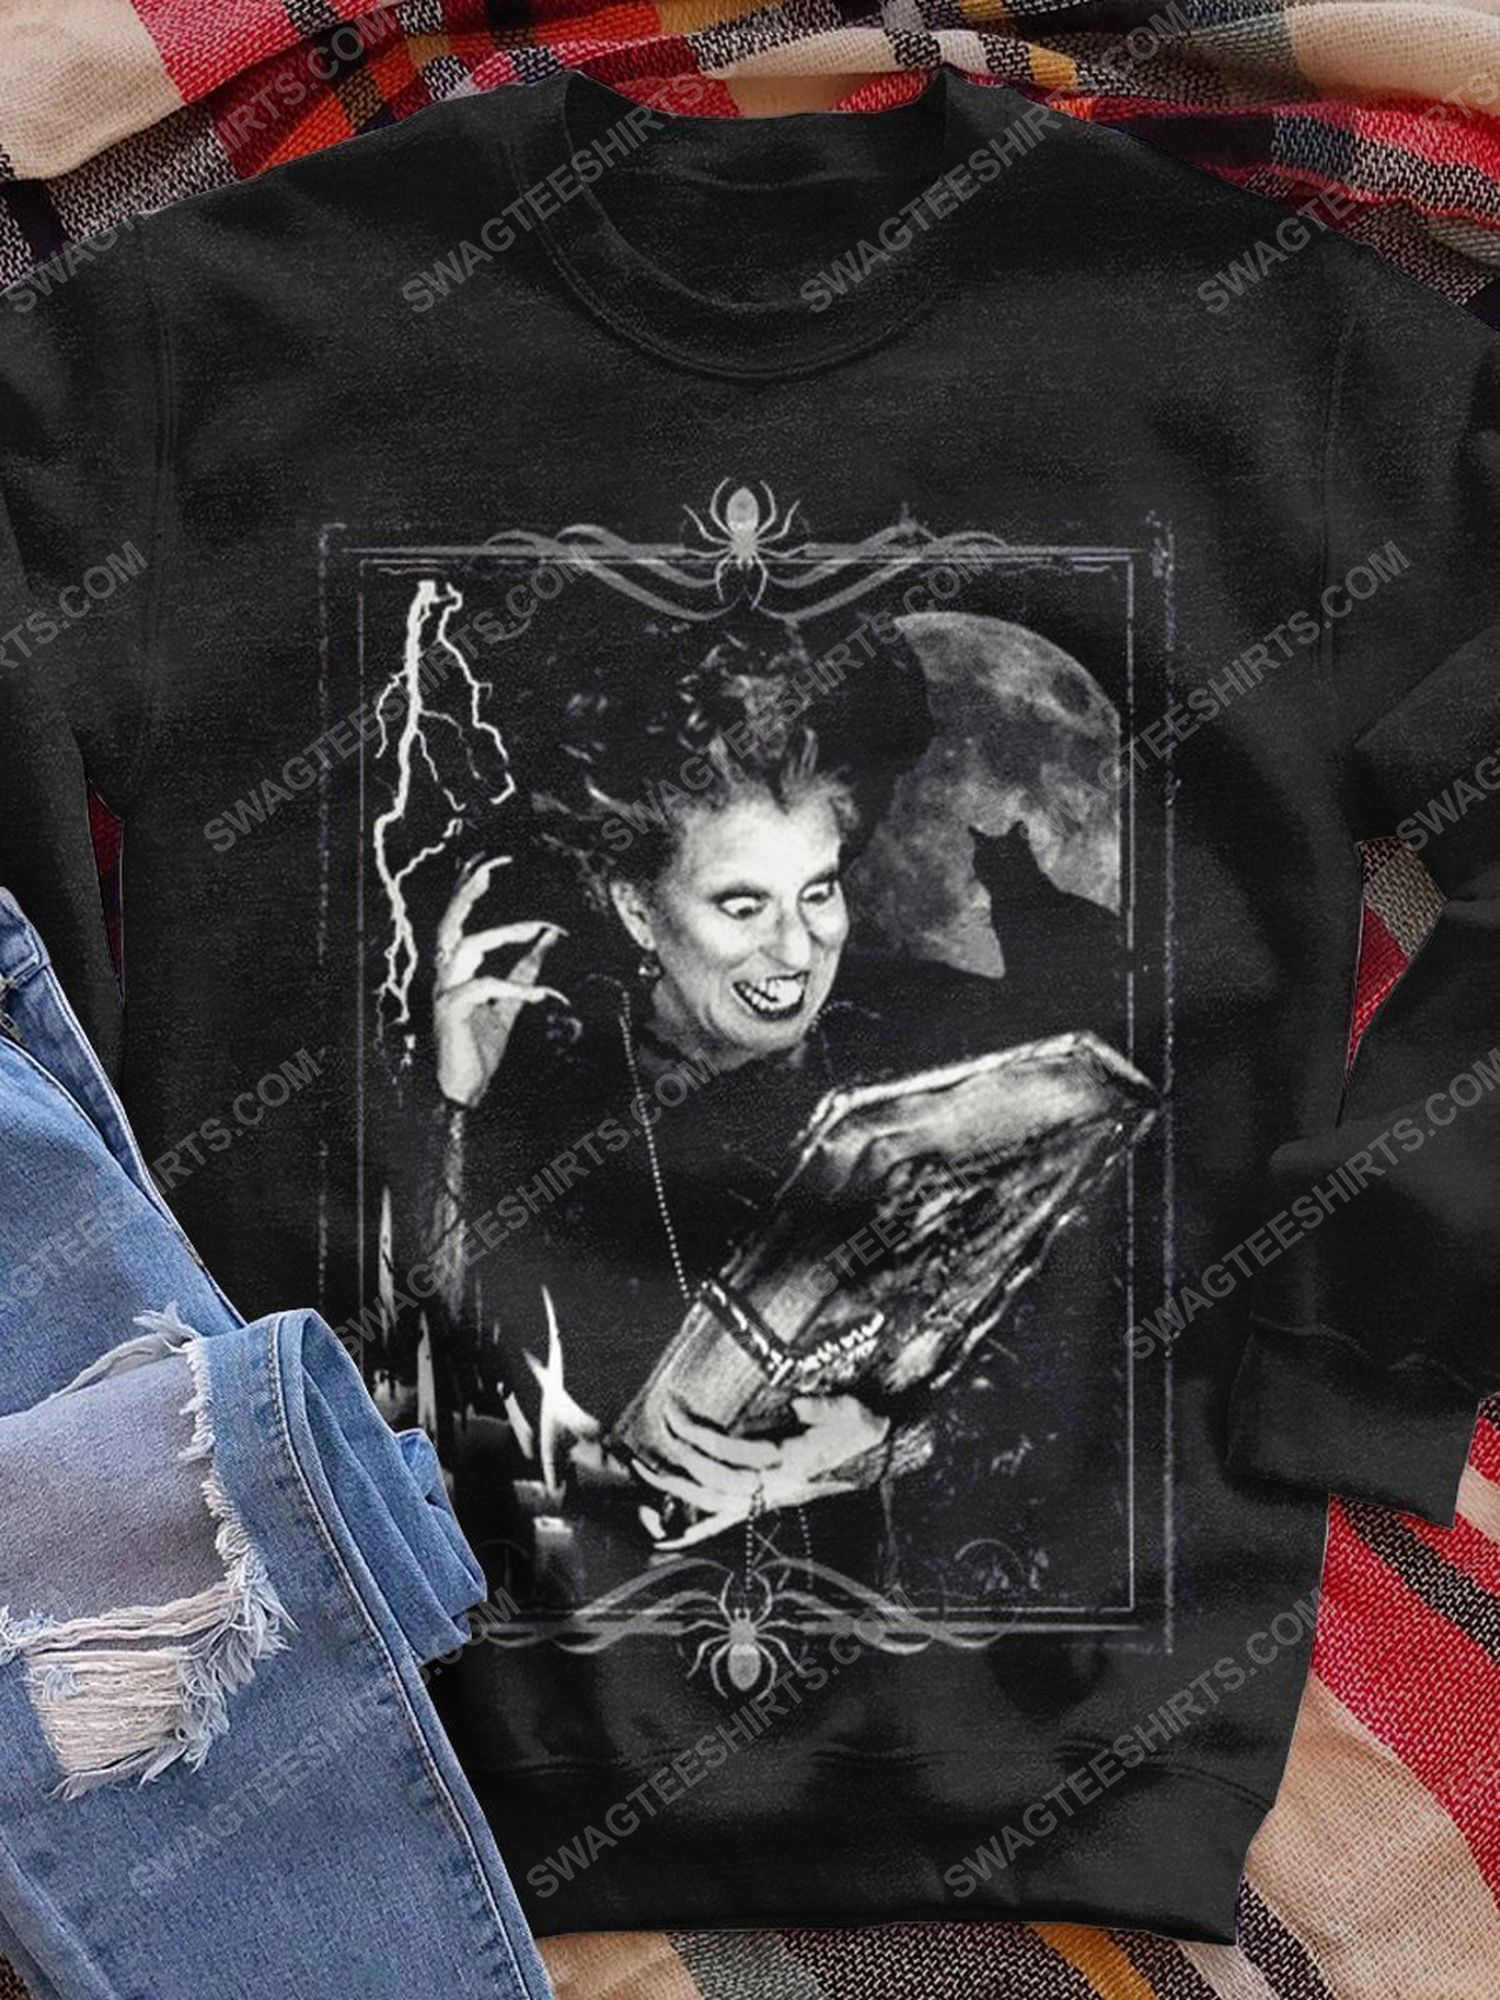 Halloween night hocus pocus witch shirt 1 - Copy